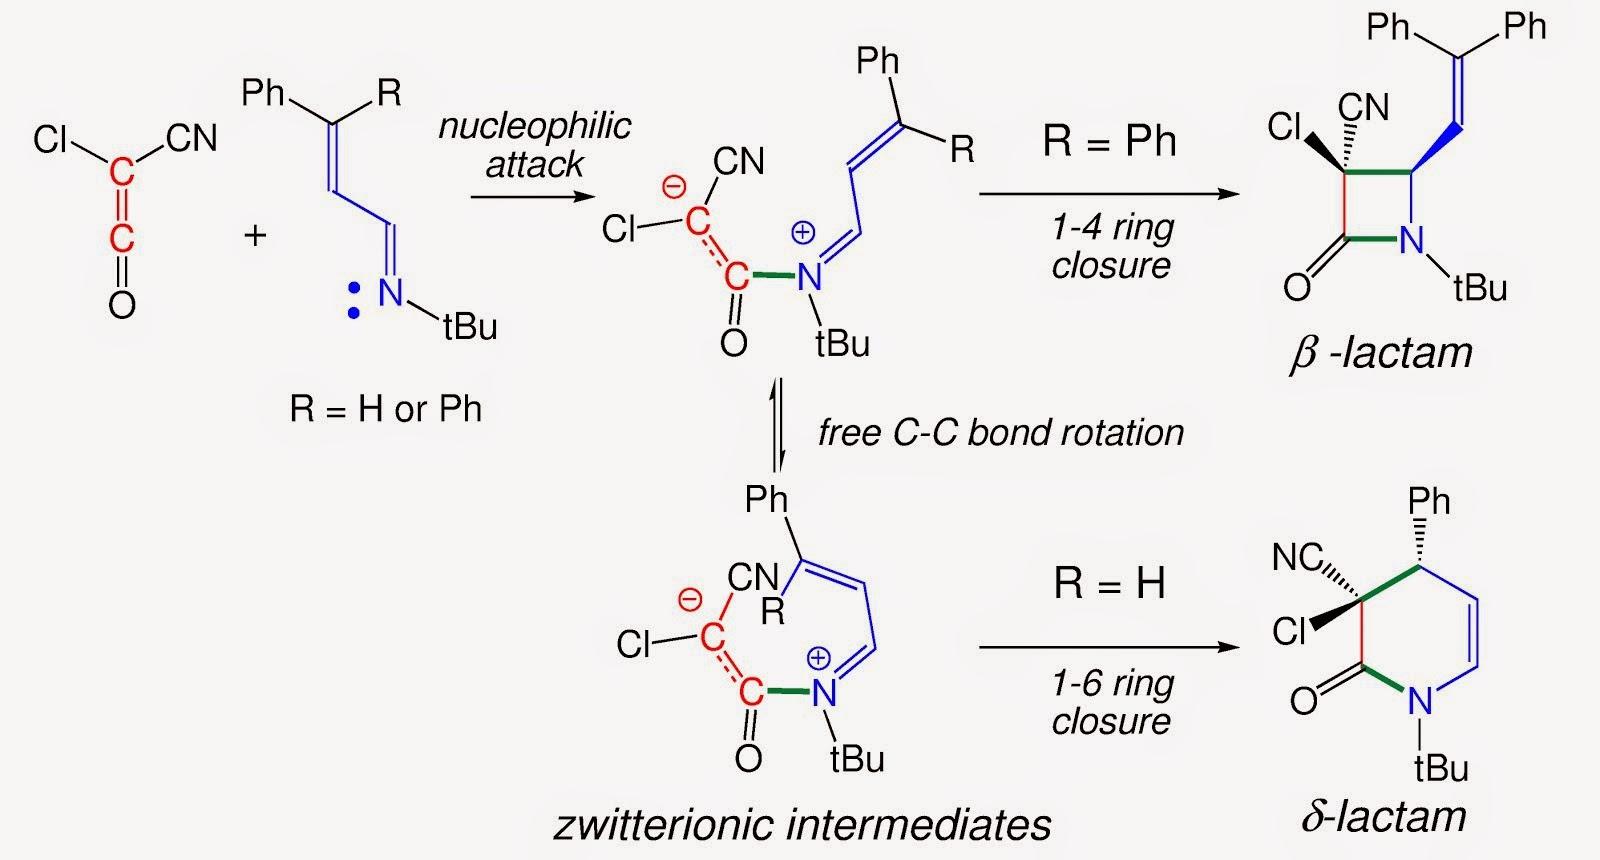 d-lactams vs b-lactams in Saudinger reactions